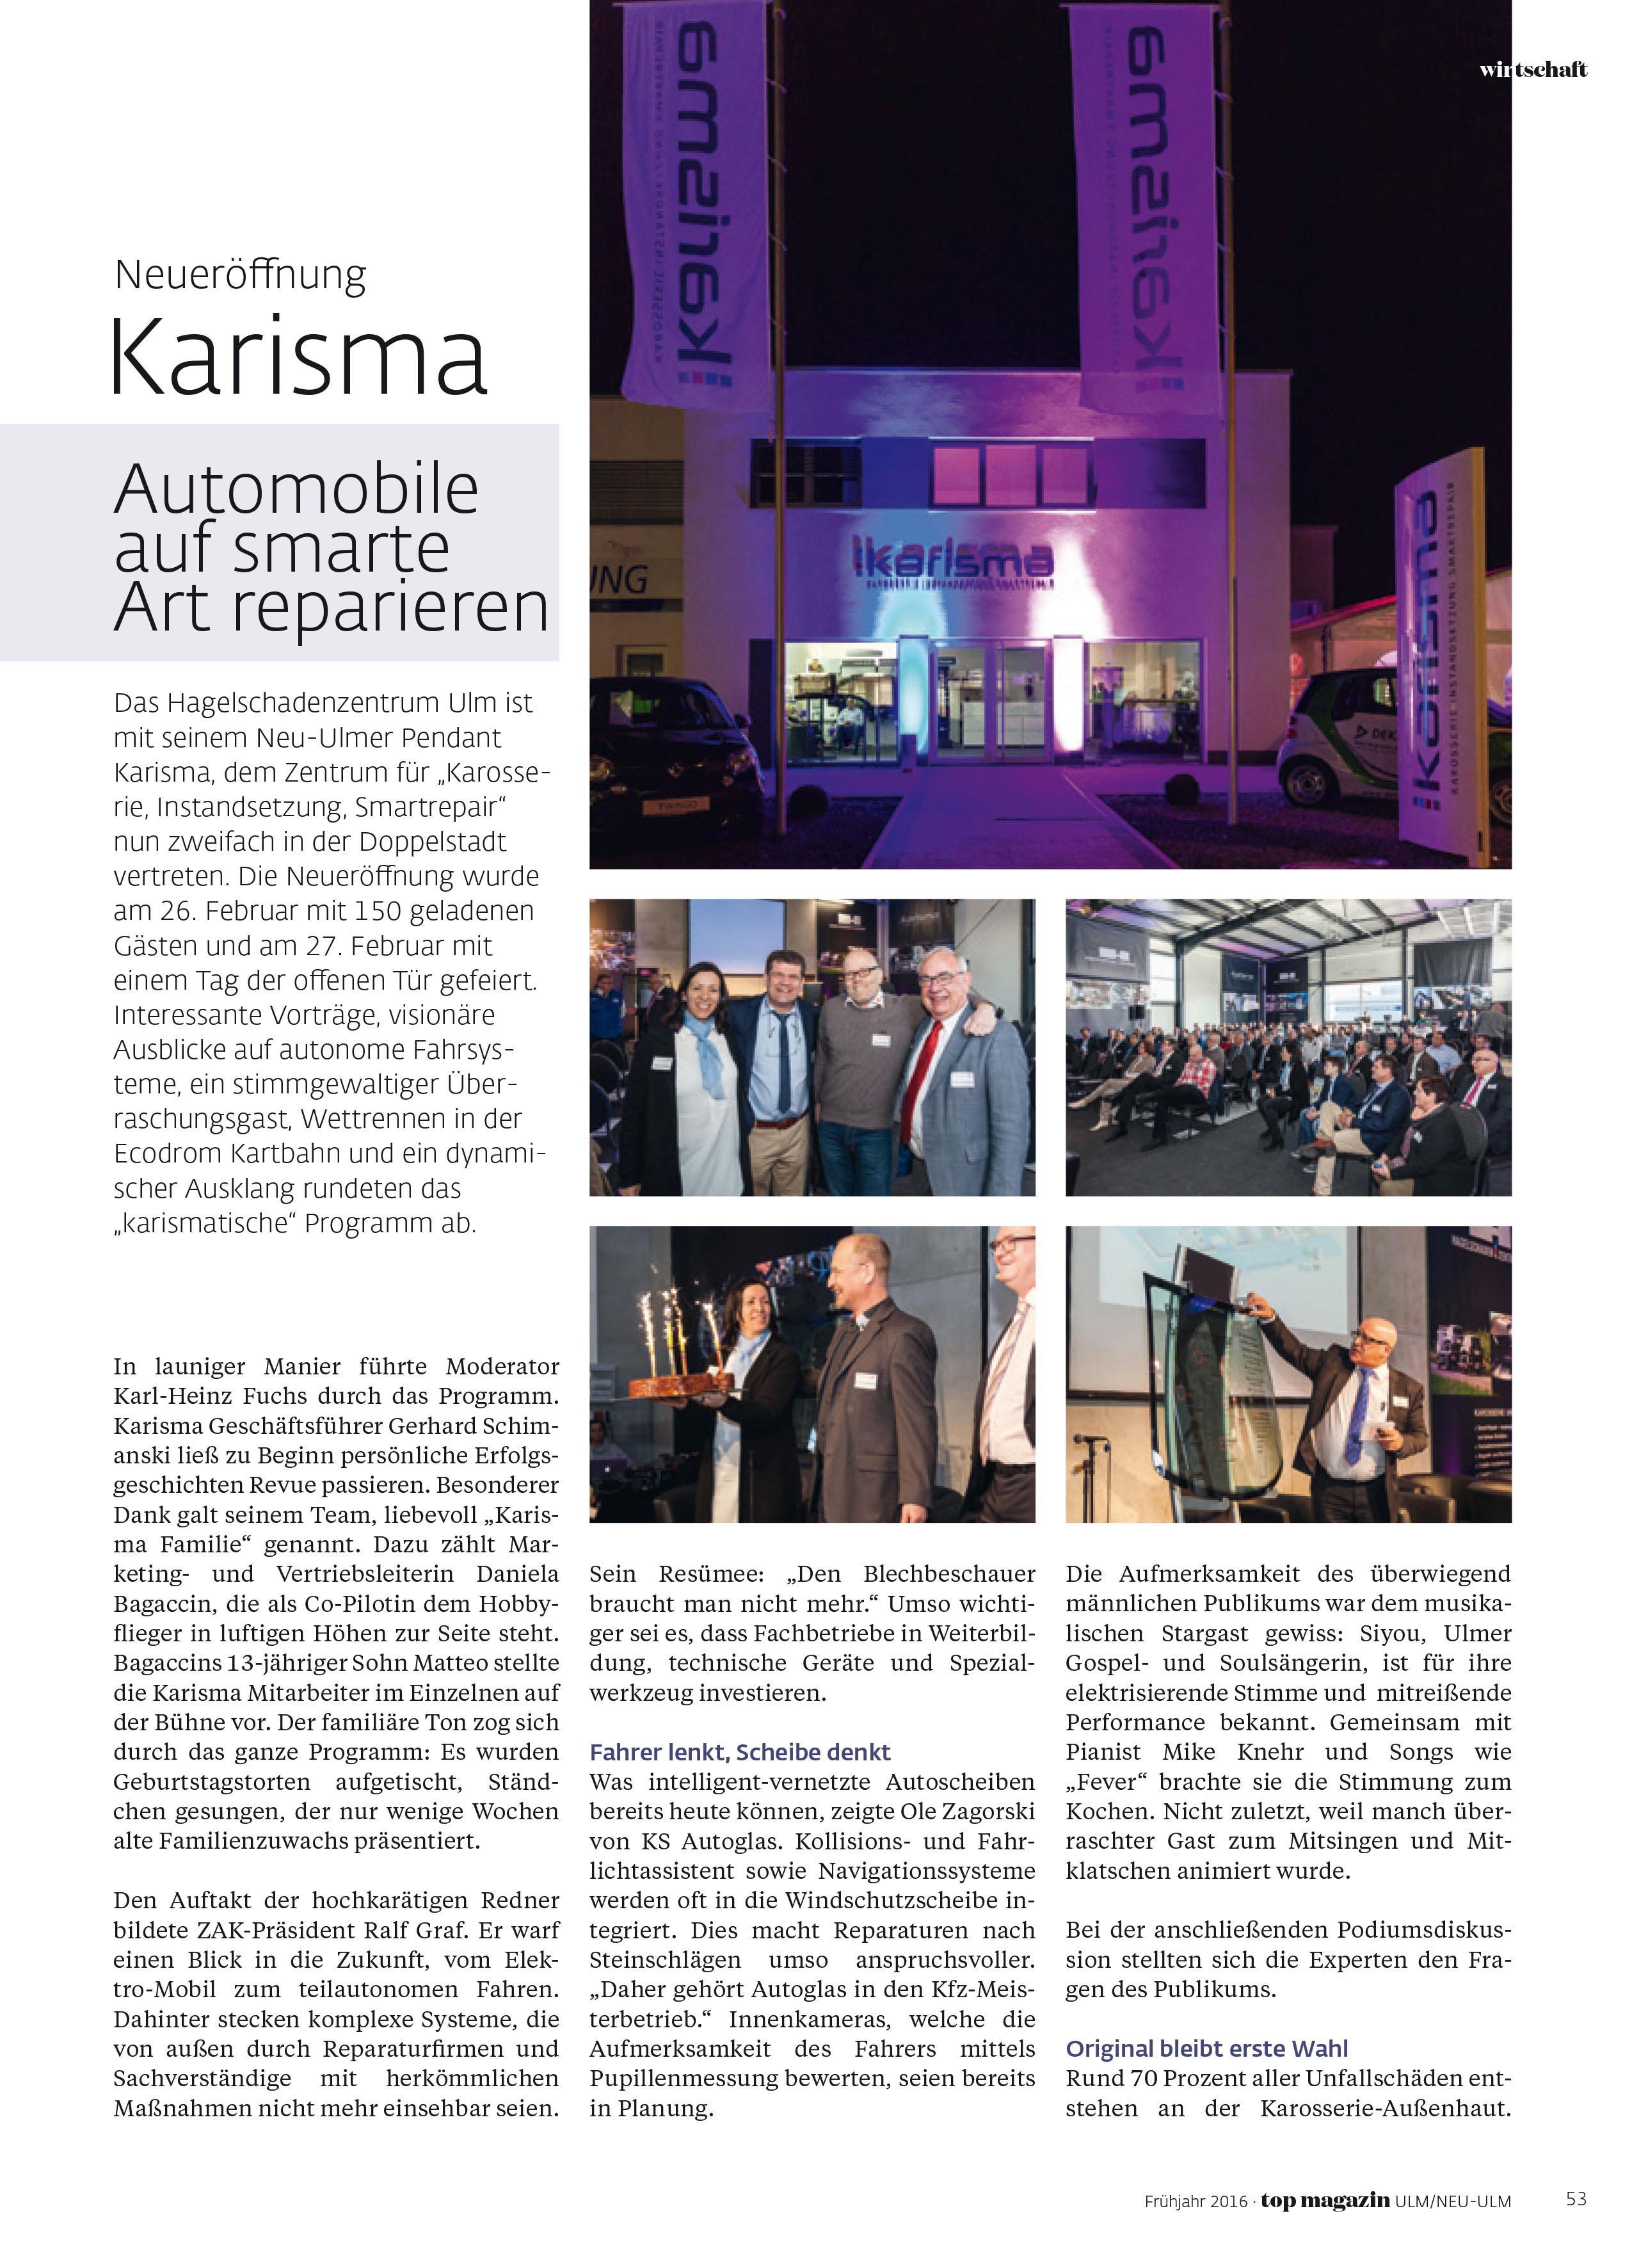 knu-presse-top-magazin-ulm-neueroeffnung-karisma-1-oks